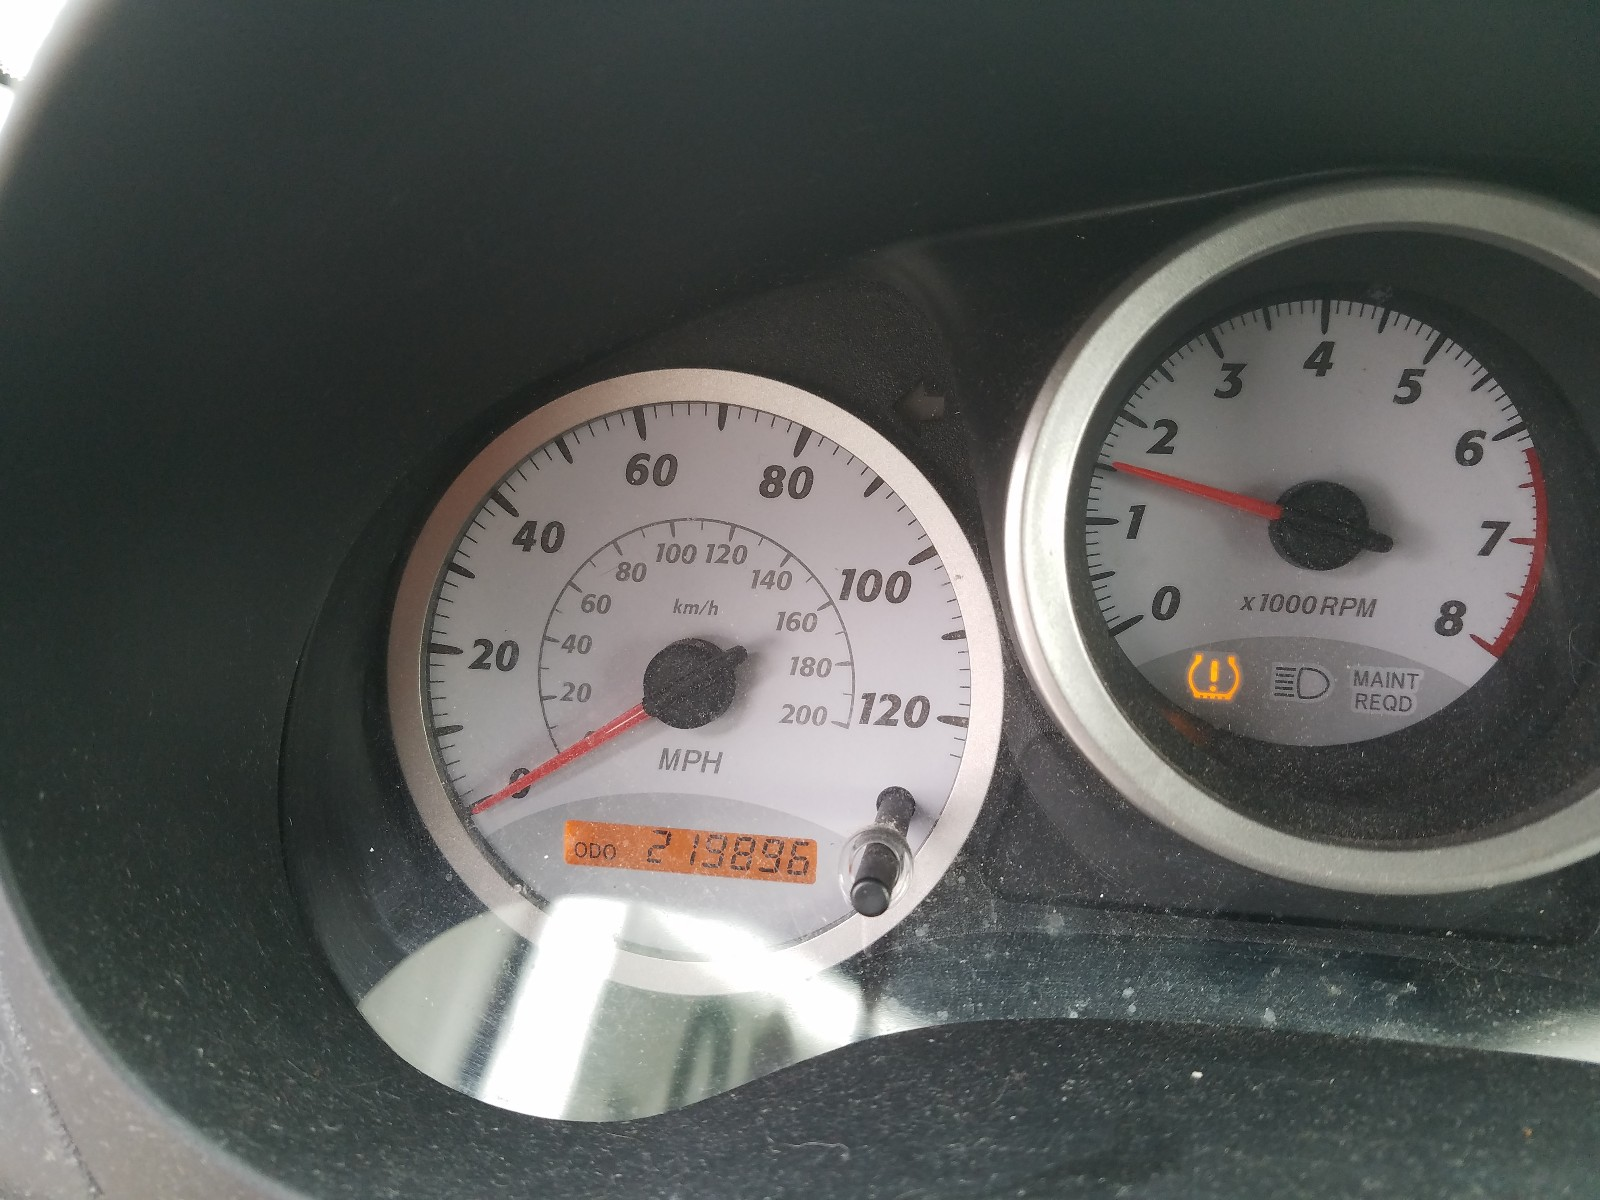 JTEGD20V740042385 - 2004 Toyota Rav4 2.4L front view